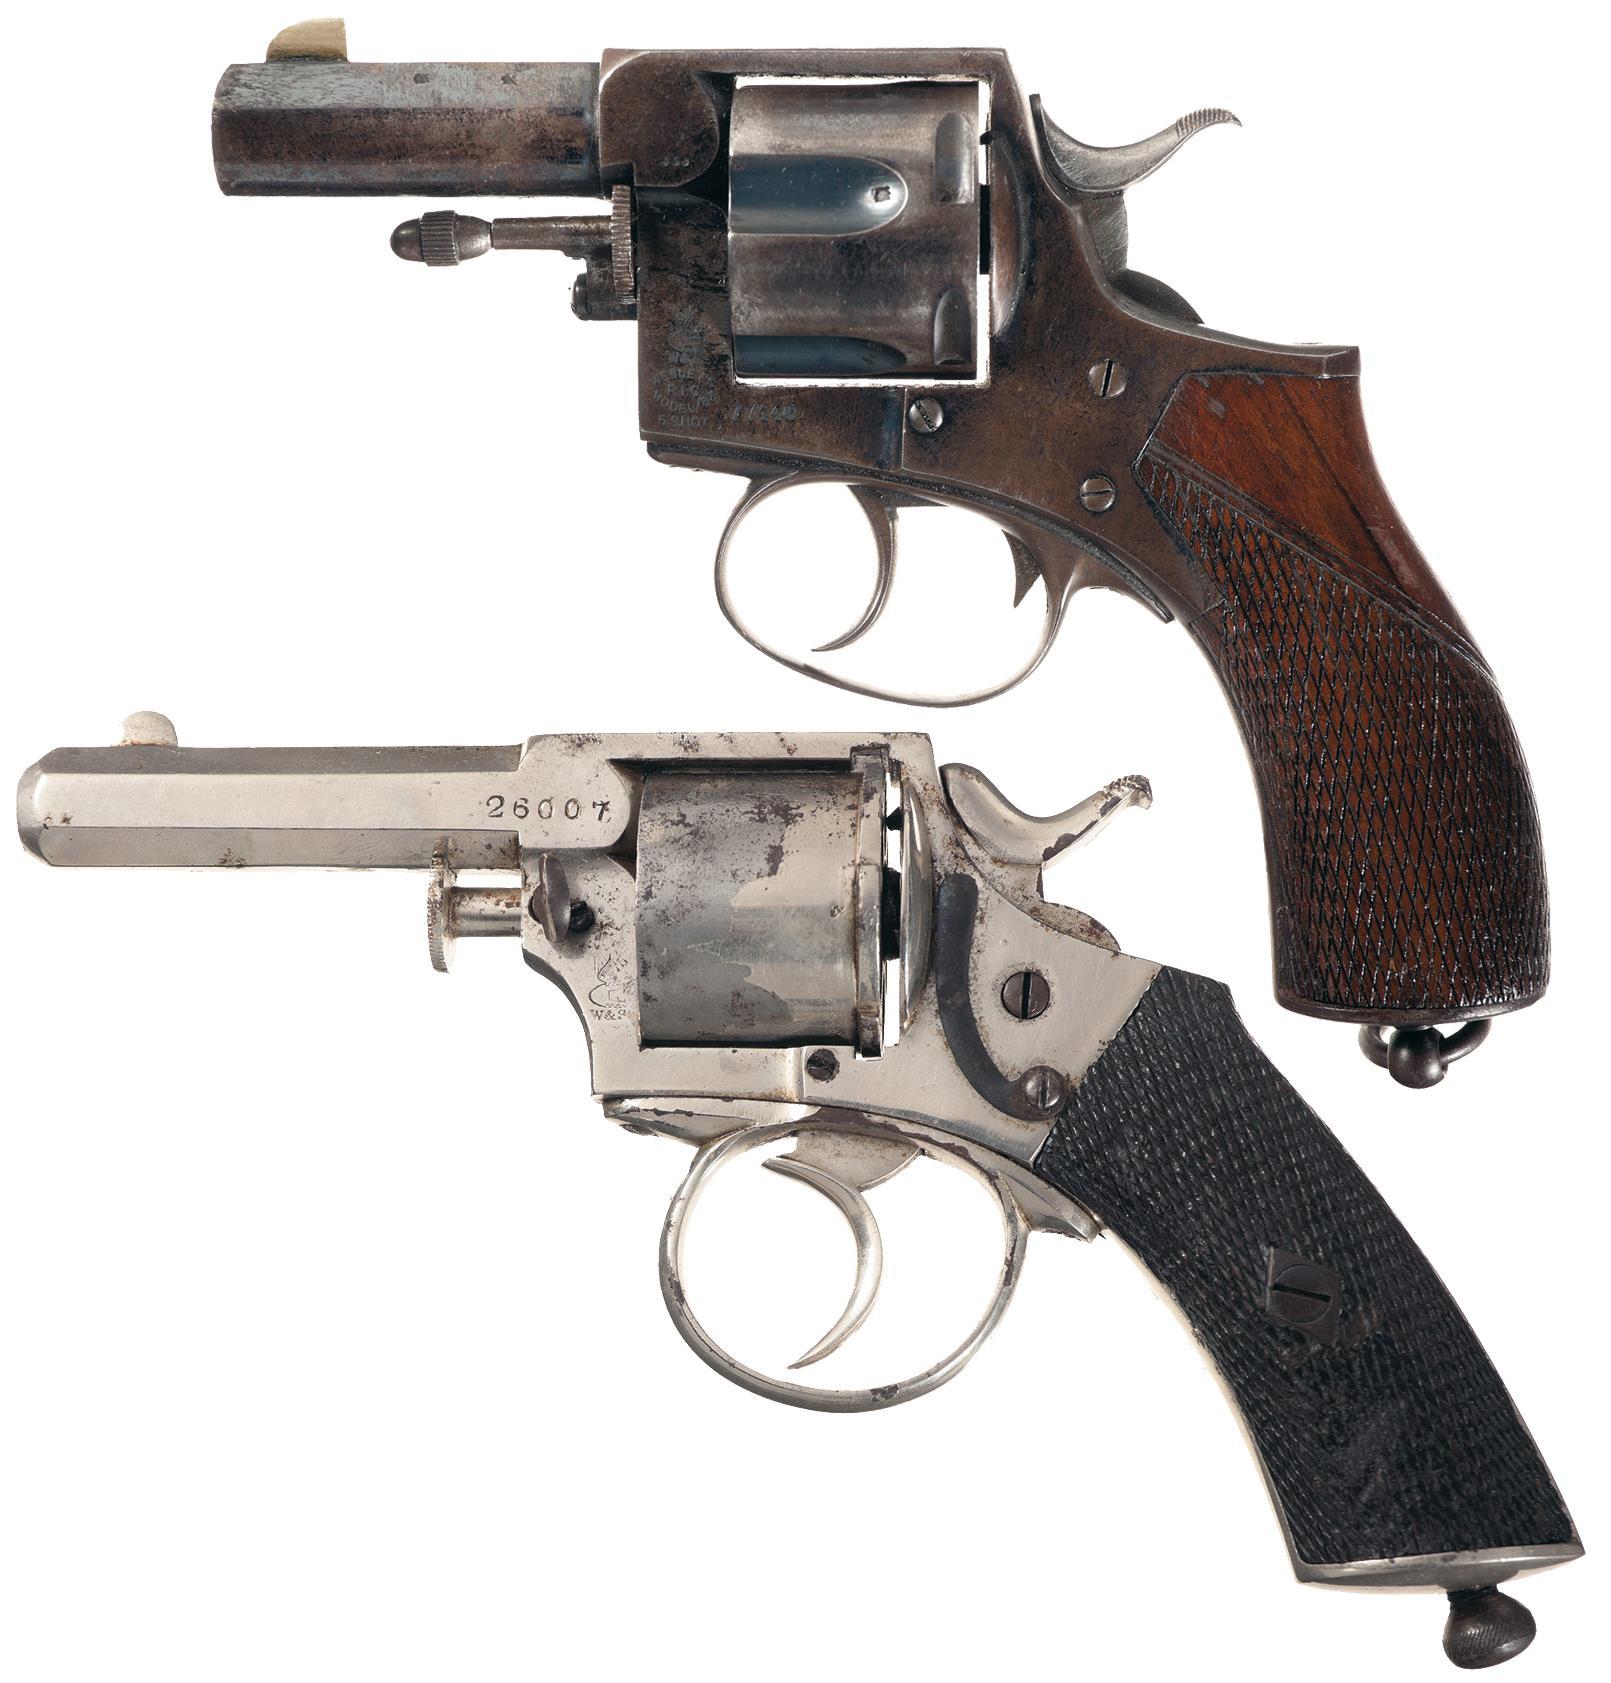 Two Webley & Scott DA Revolvers